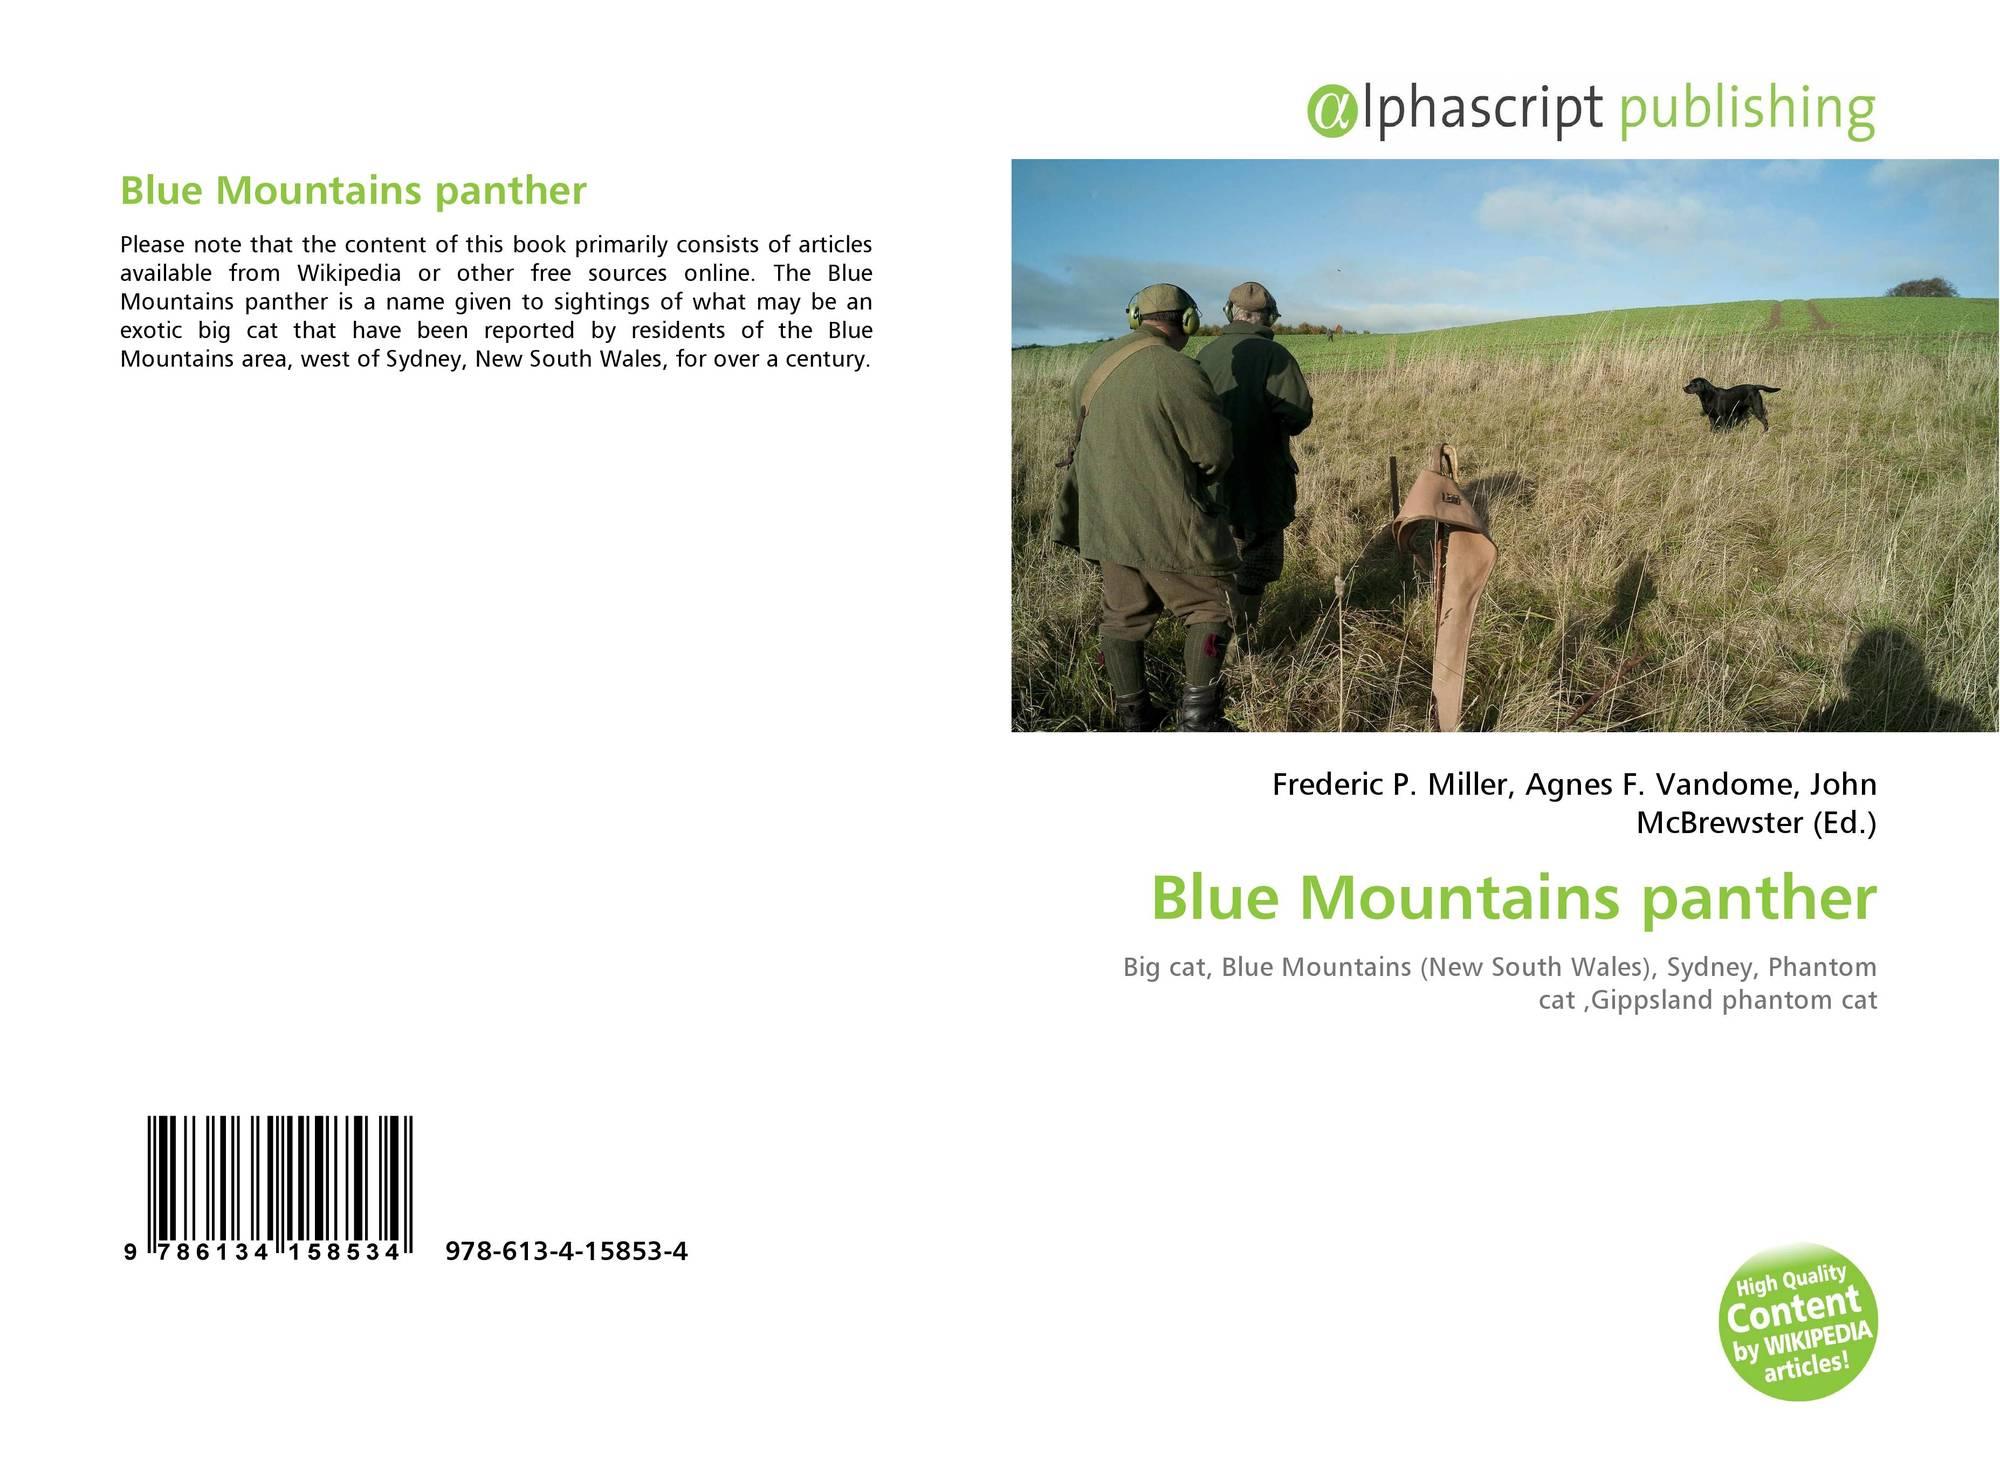 blue book report wales Amazoncom: the outlaw josey wales [blu-ray book]: clint eastwood, sondra locke, john vernon, sam bottoms, robert daley, philip kaufman: movies & tv.